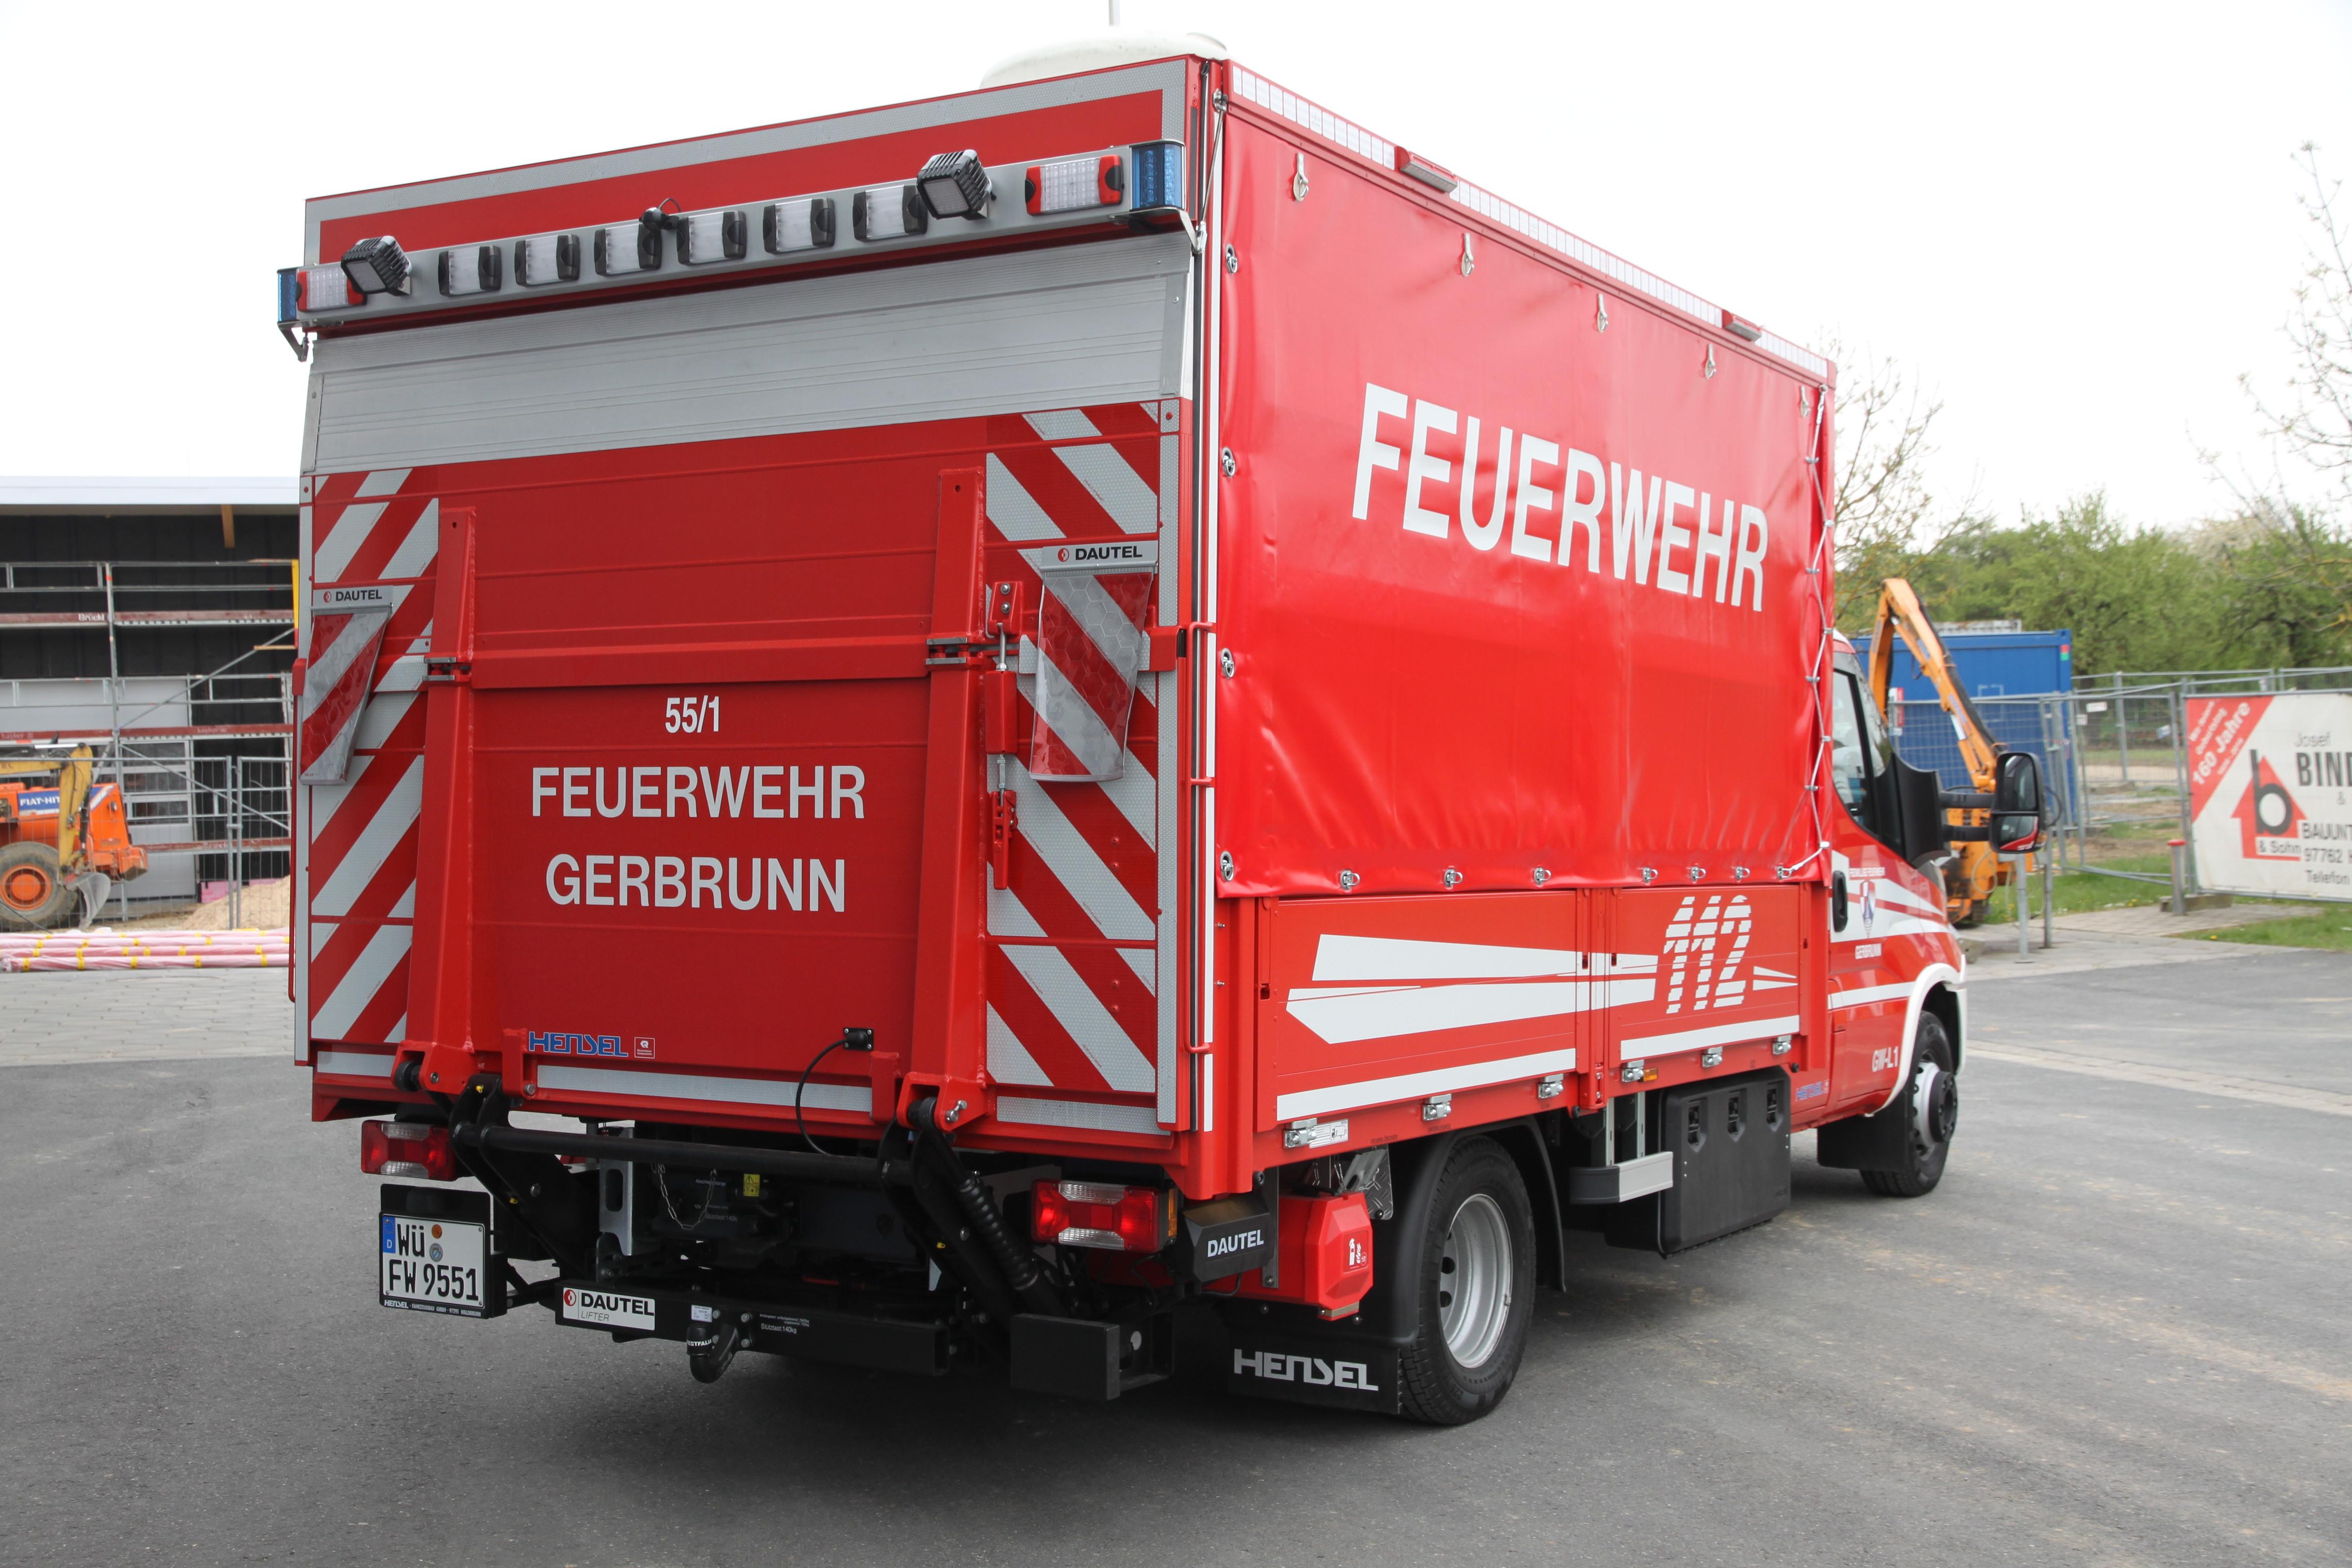 GW-L 1 - Feuerwehr Gerbrunn